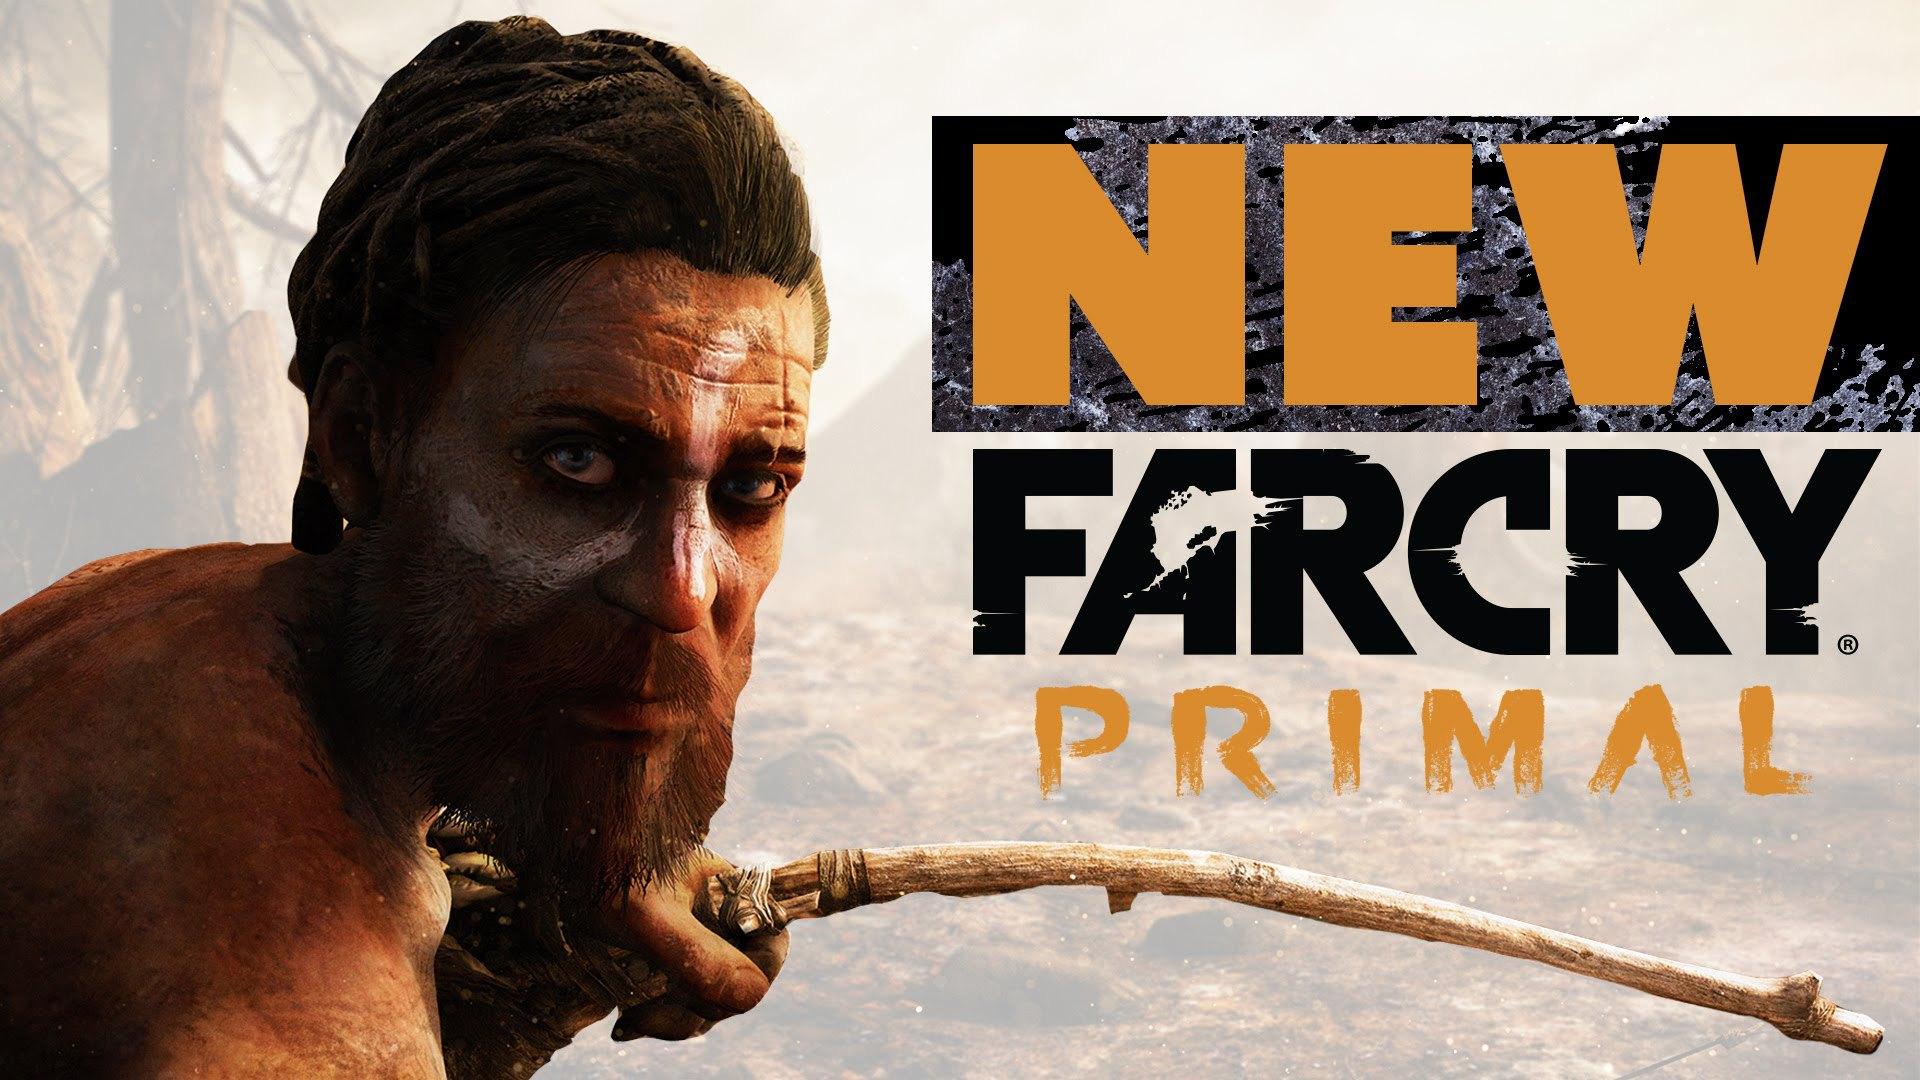 Far Cry Primal Game